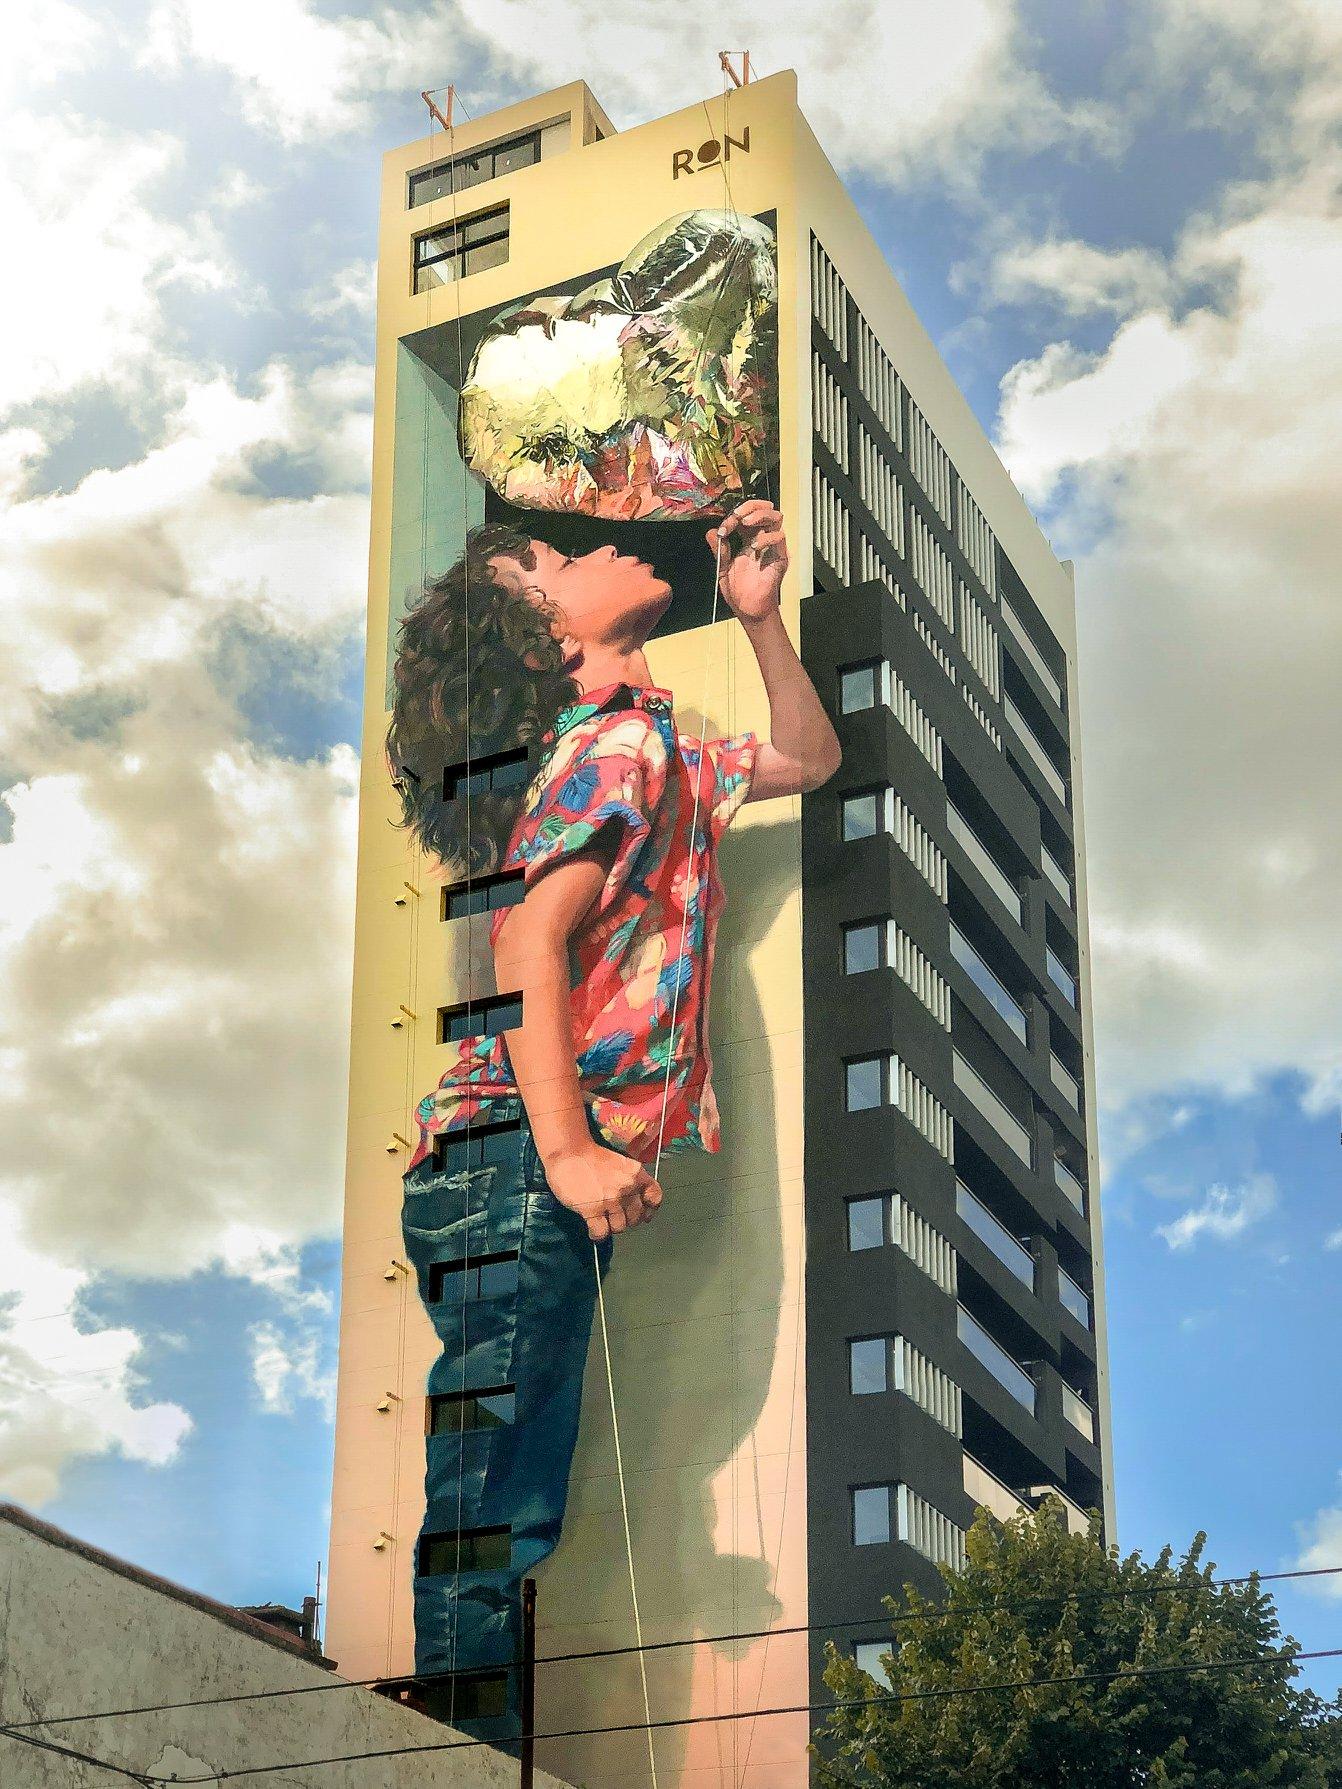 Martin Ron in Buenos Aires, Argentina | StreetArtNews